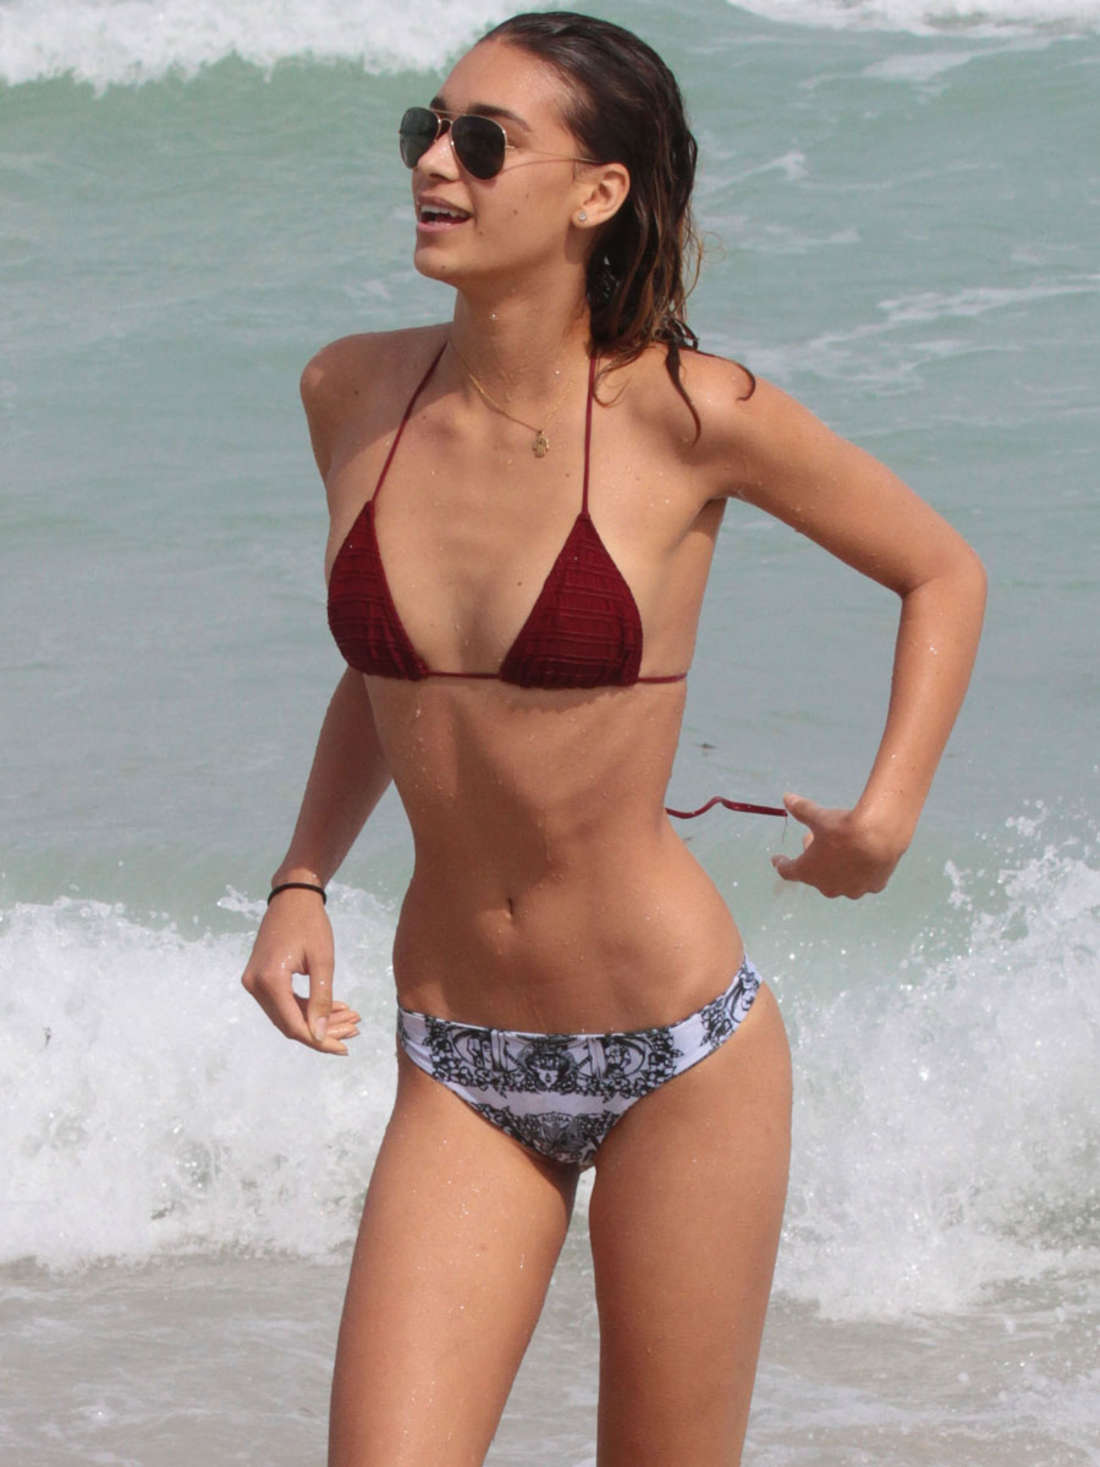 Bikini April Love nudes (43 images), Sexy